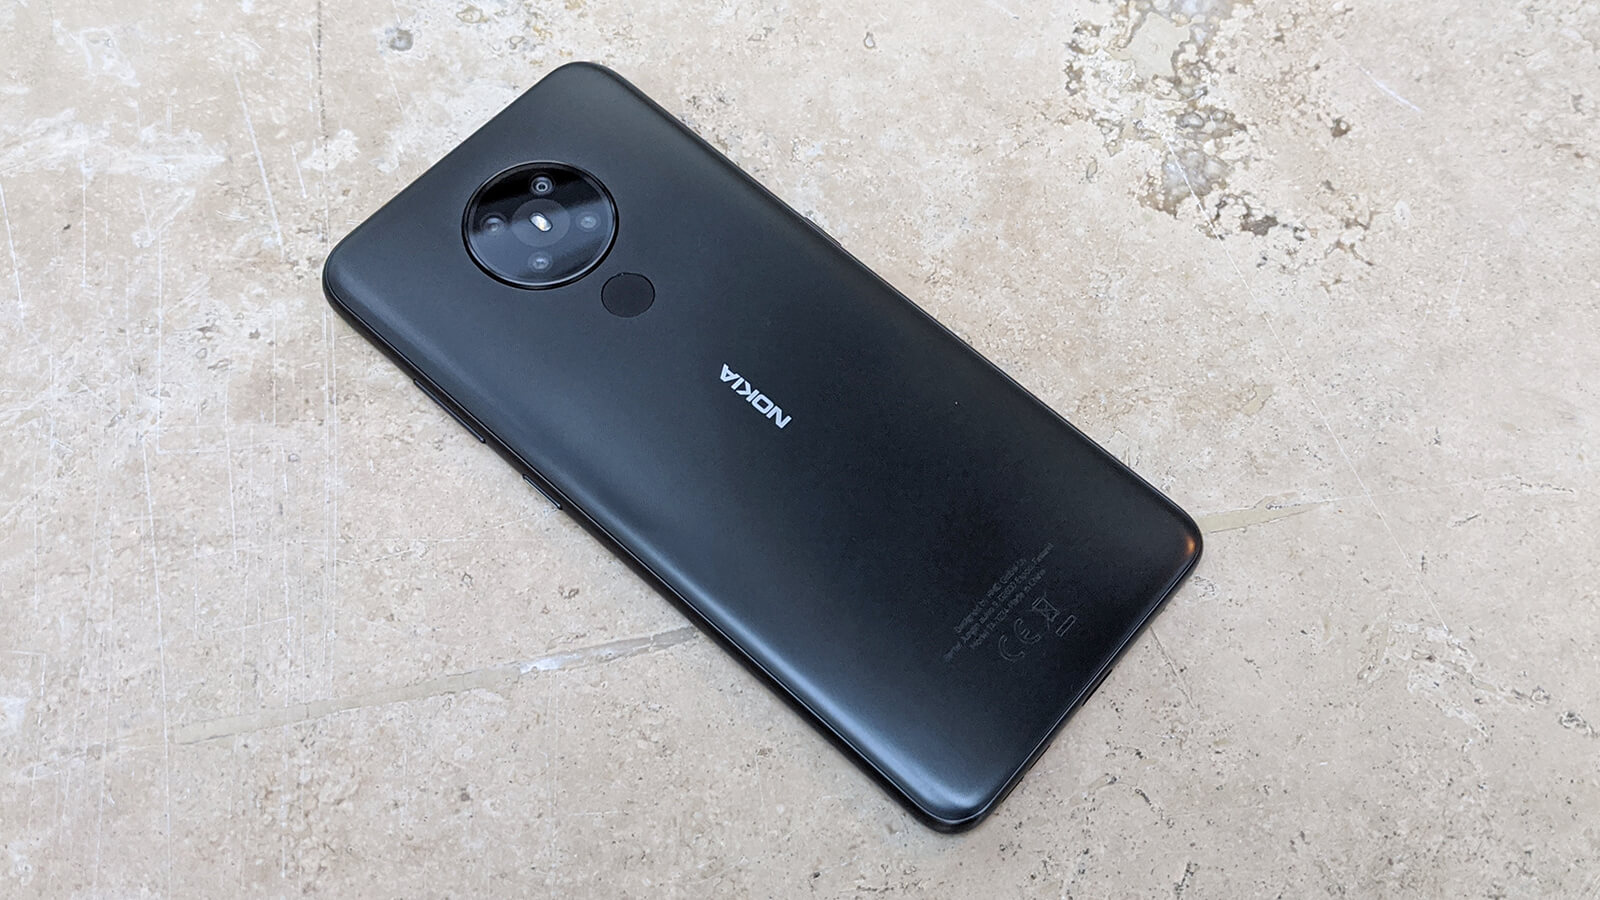 Nokia 3 4 triple camera smartphone